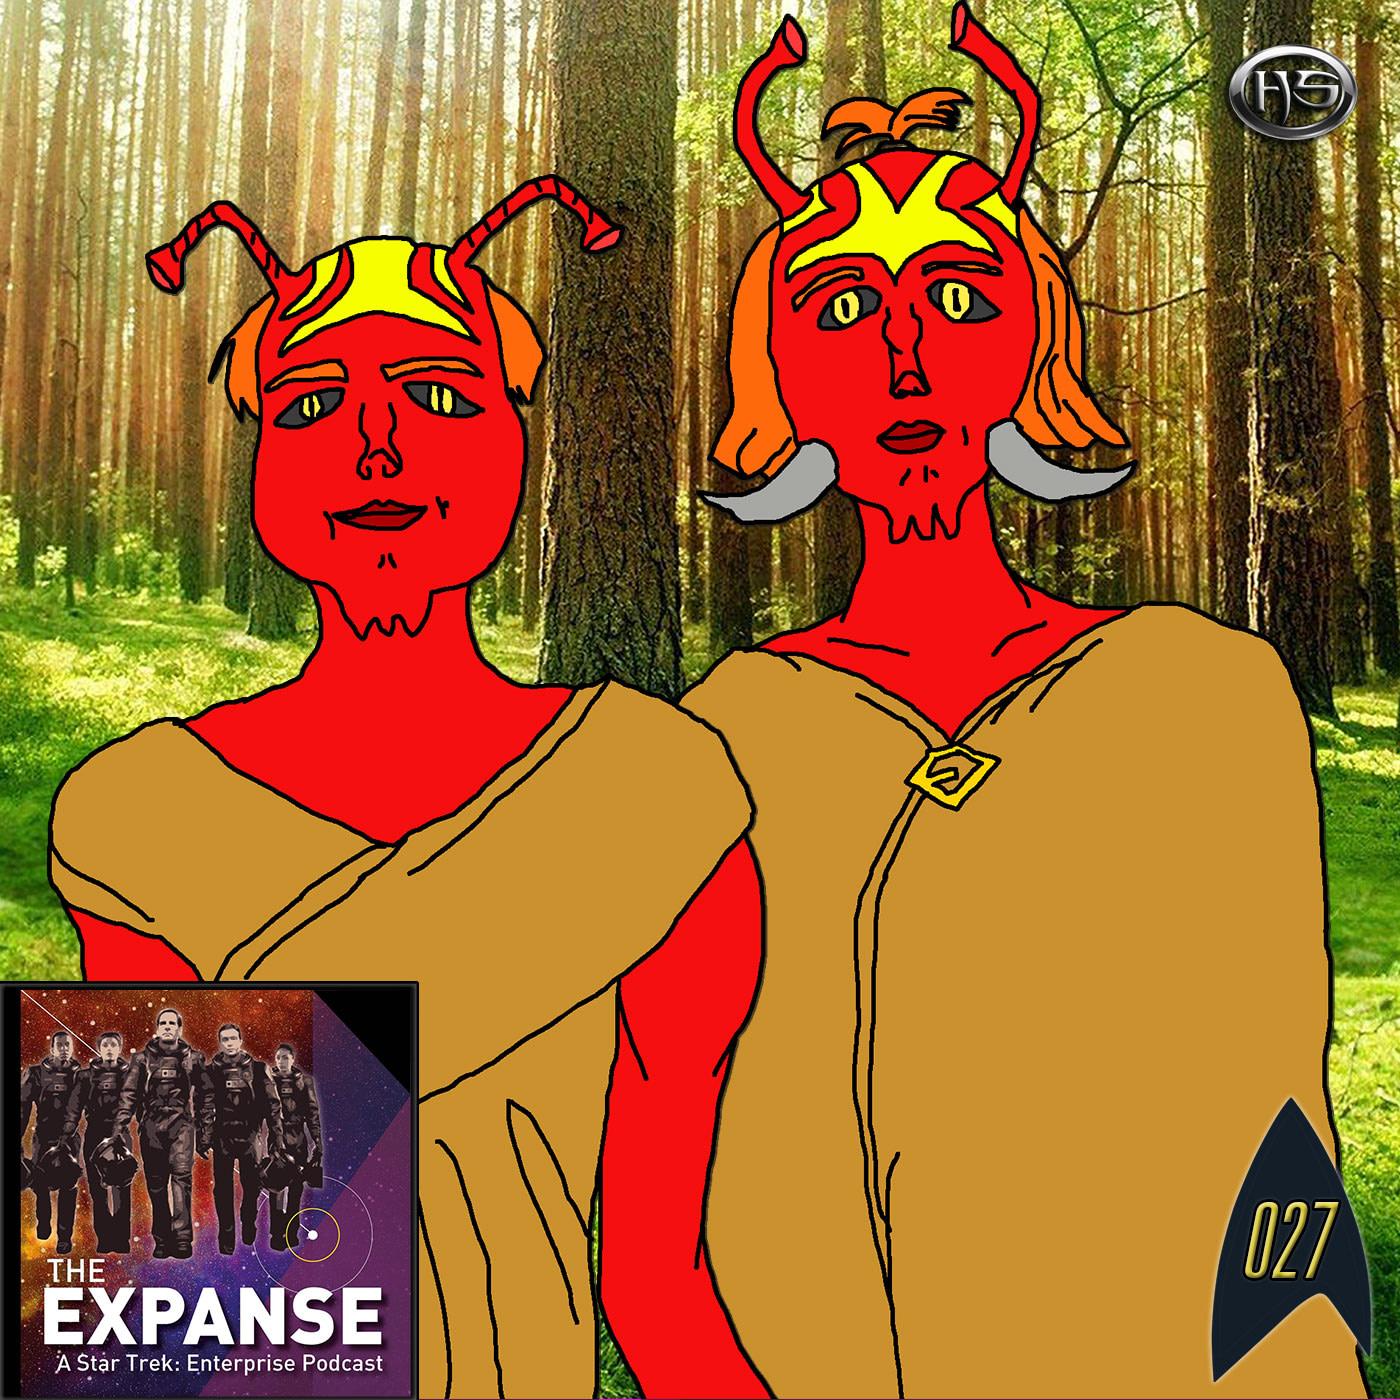 The Expanse Episode 27